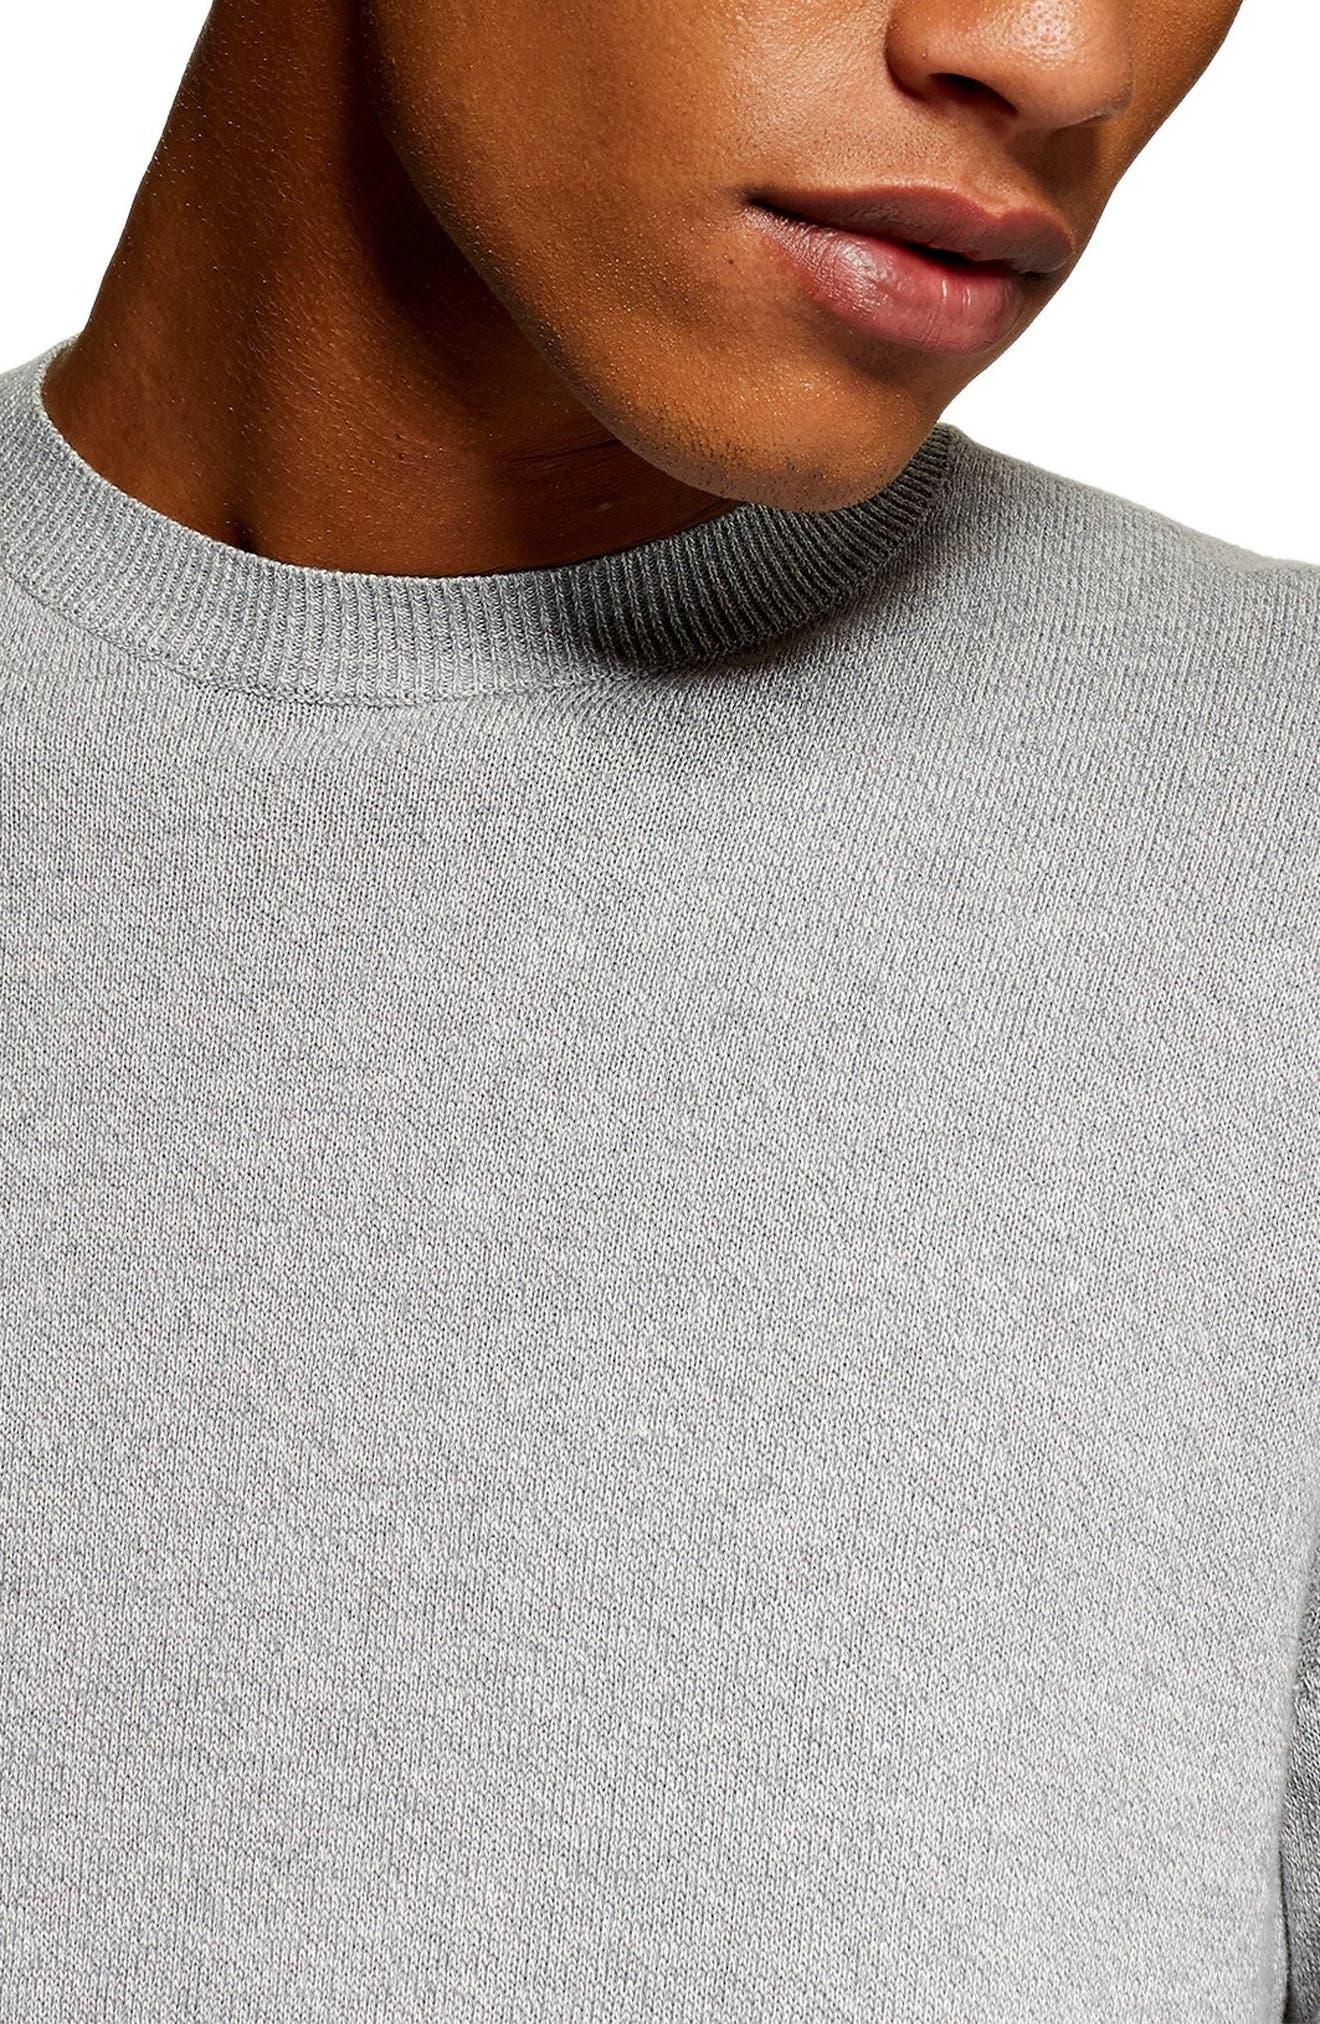 Marl Crewneck Sweater,                             Alternate thumbnail 3, color,                             CREAM